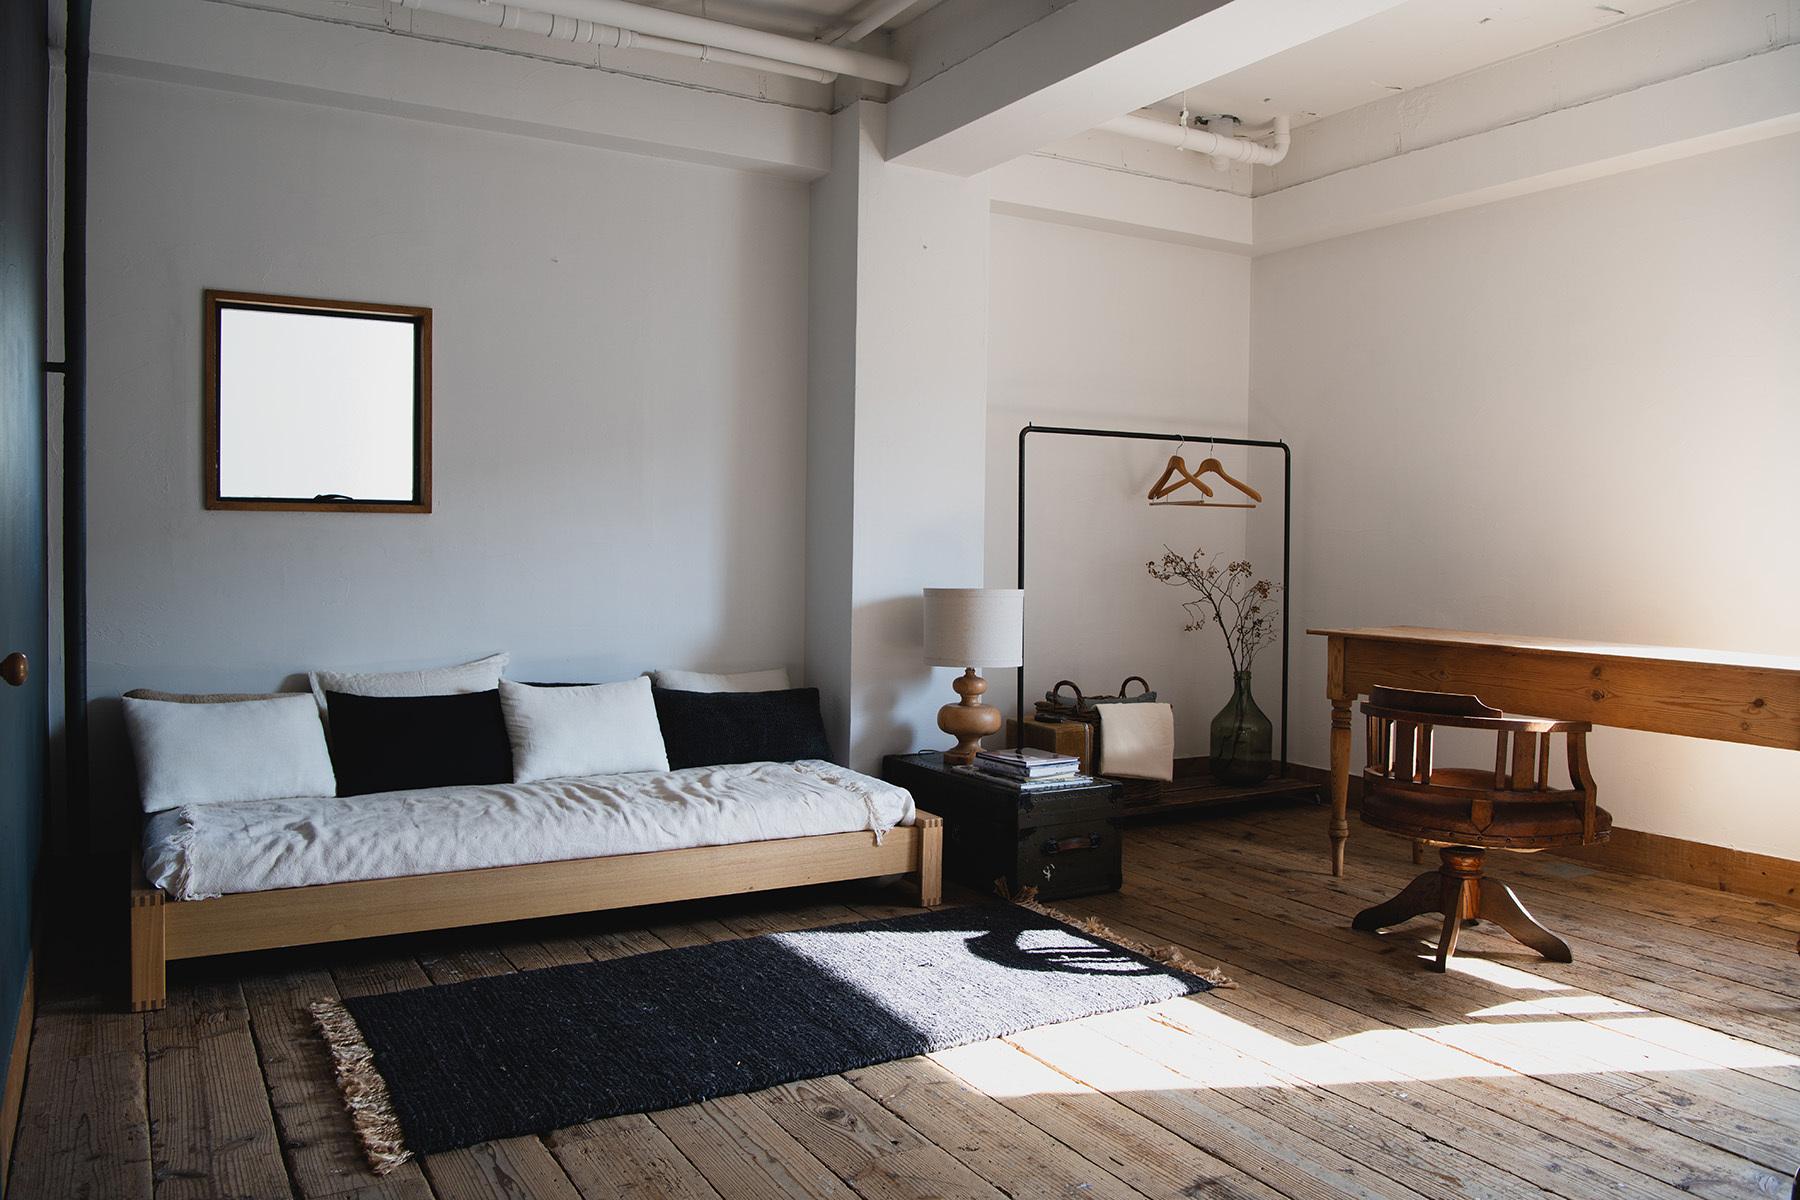 studio rue scipion  (スタジオ リュシピオン)ウッドフロアの窓